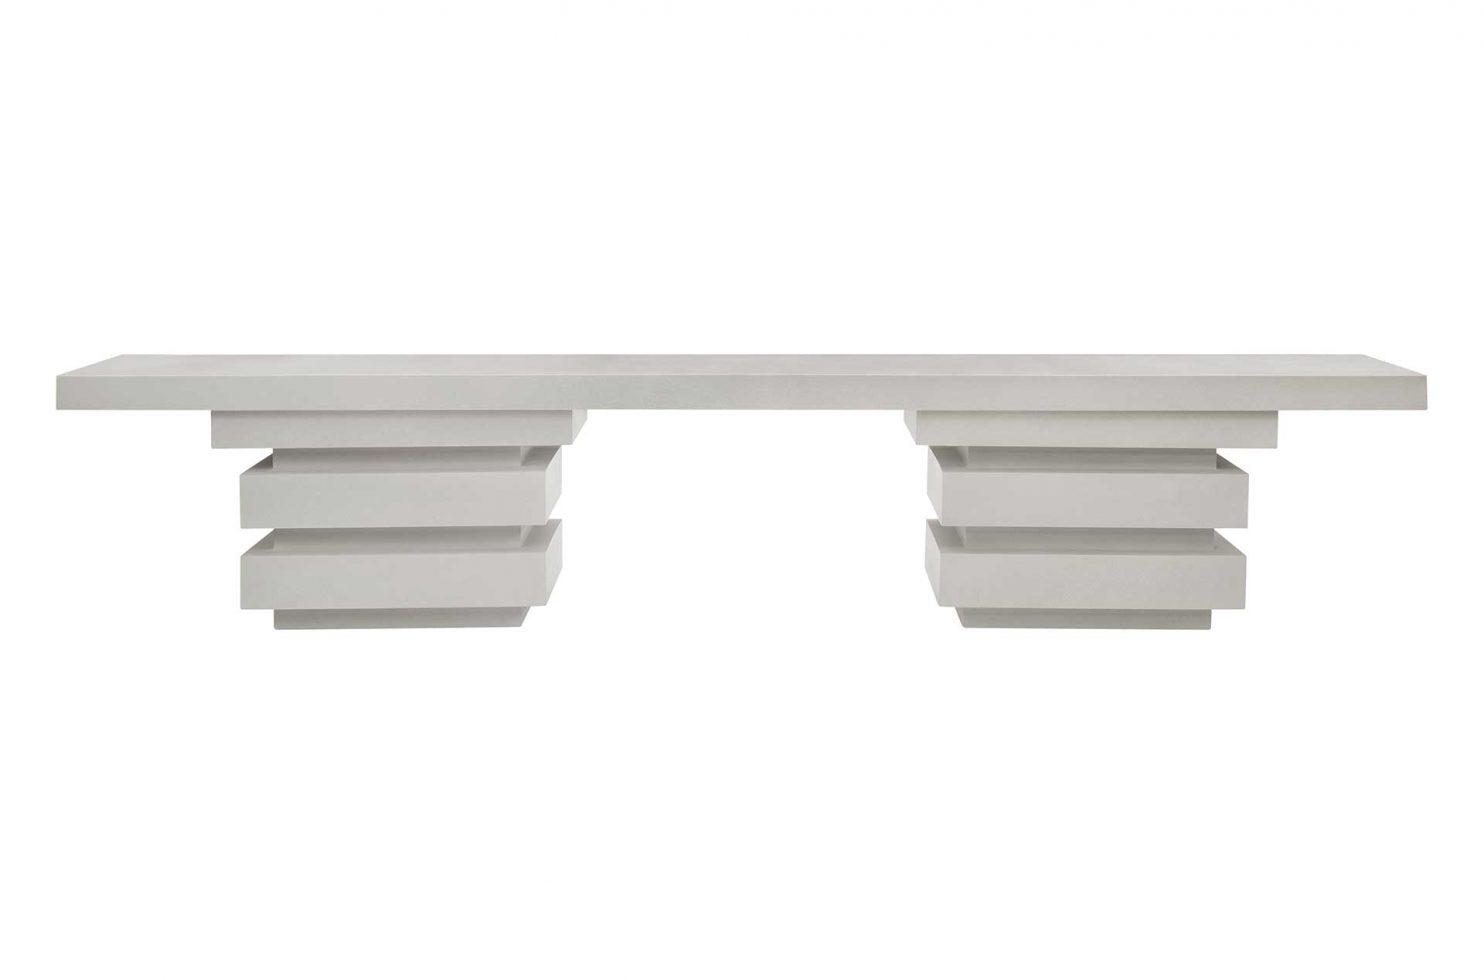 prov frp meditation rectangle bench S1568100215 1 front web